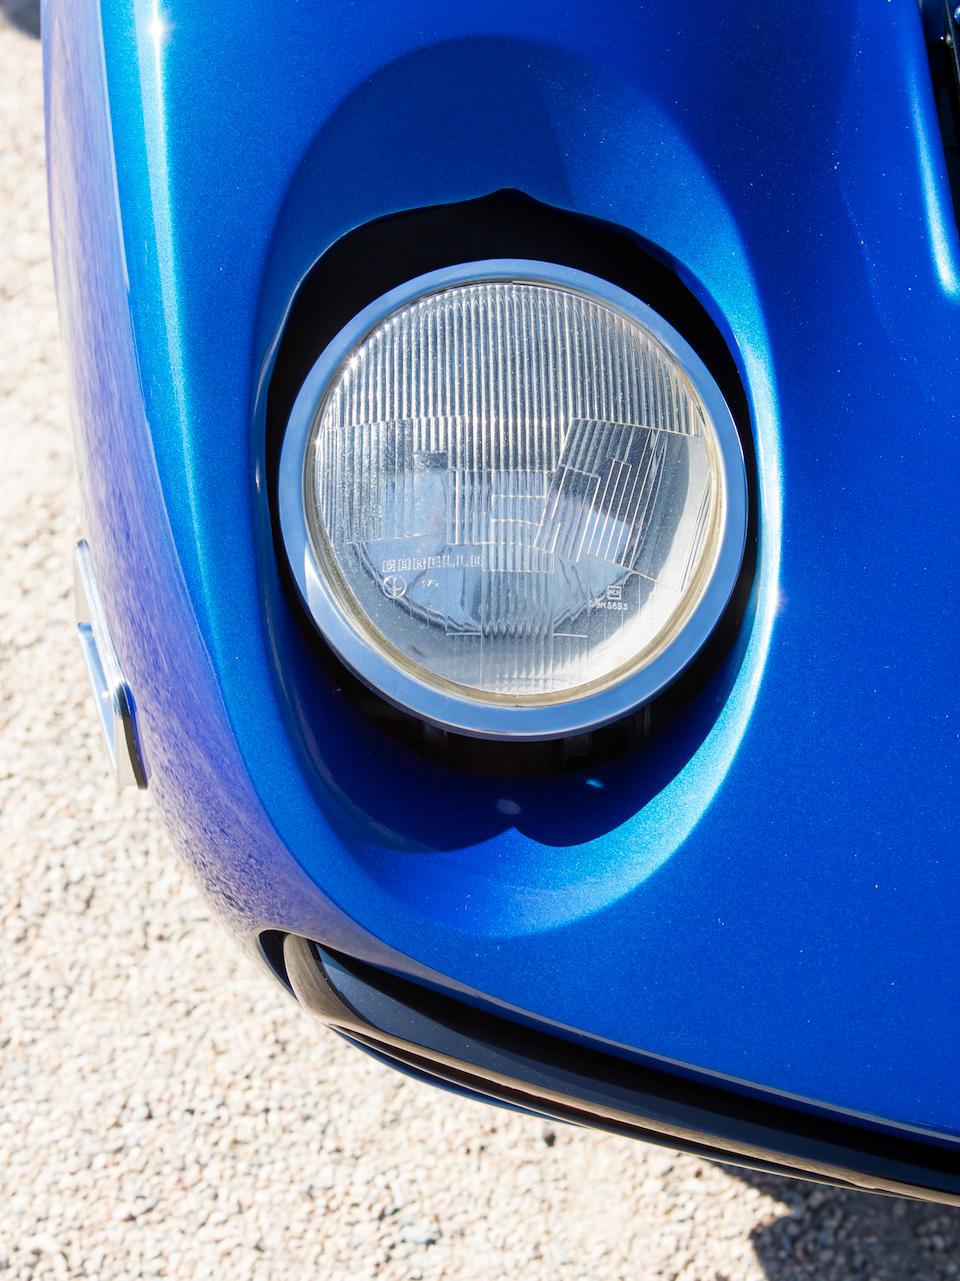 <b>1971 Lamborghini Miura SV</b><br />Chassis no. 4976<br />Engine no. 30692 (see text)